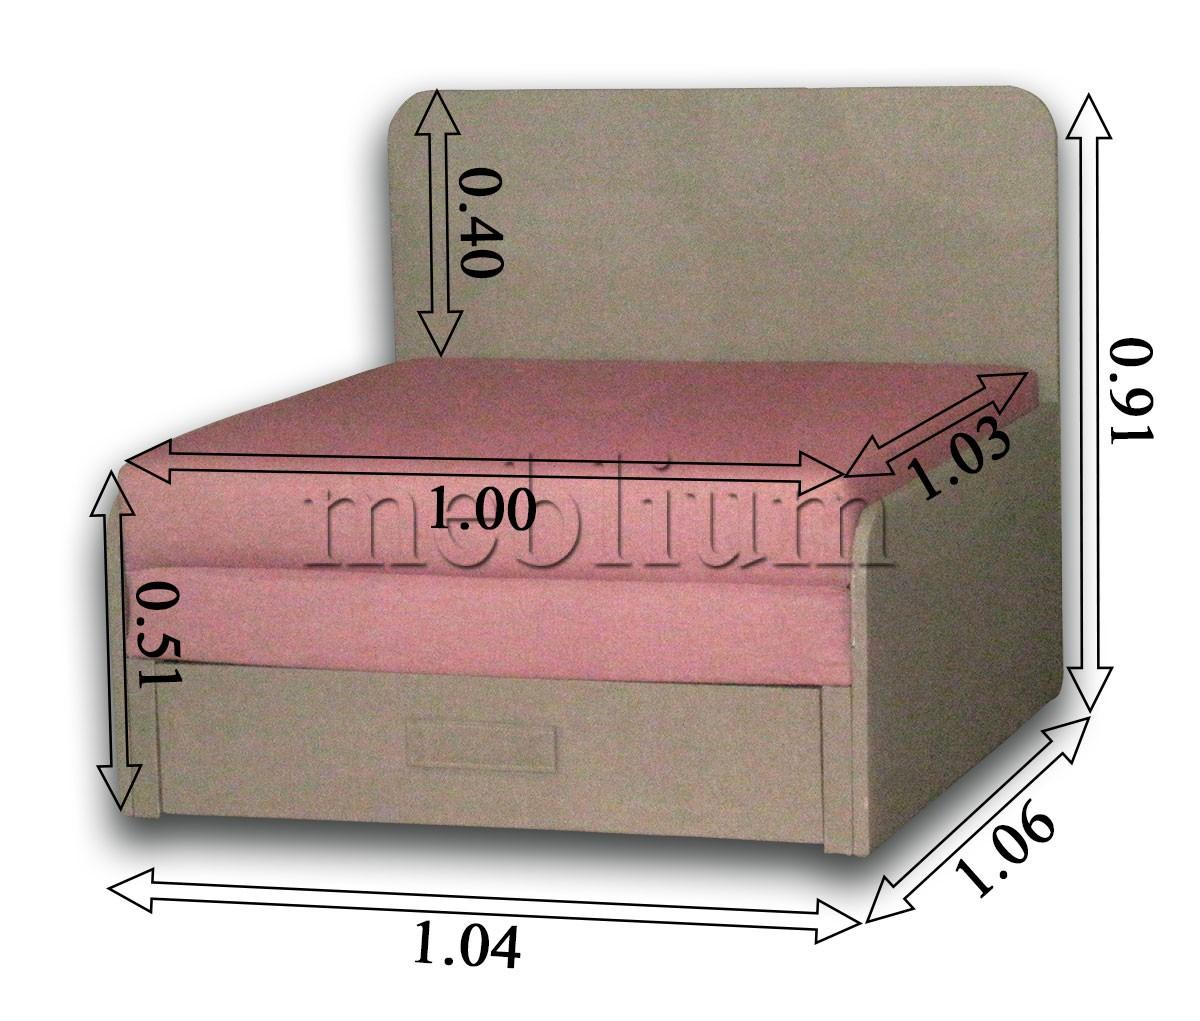 Диван Омега 1,00-42 комэт розовый, подушки бязь цветы